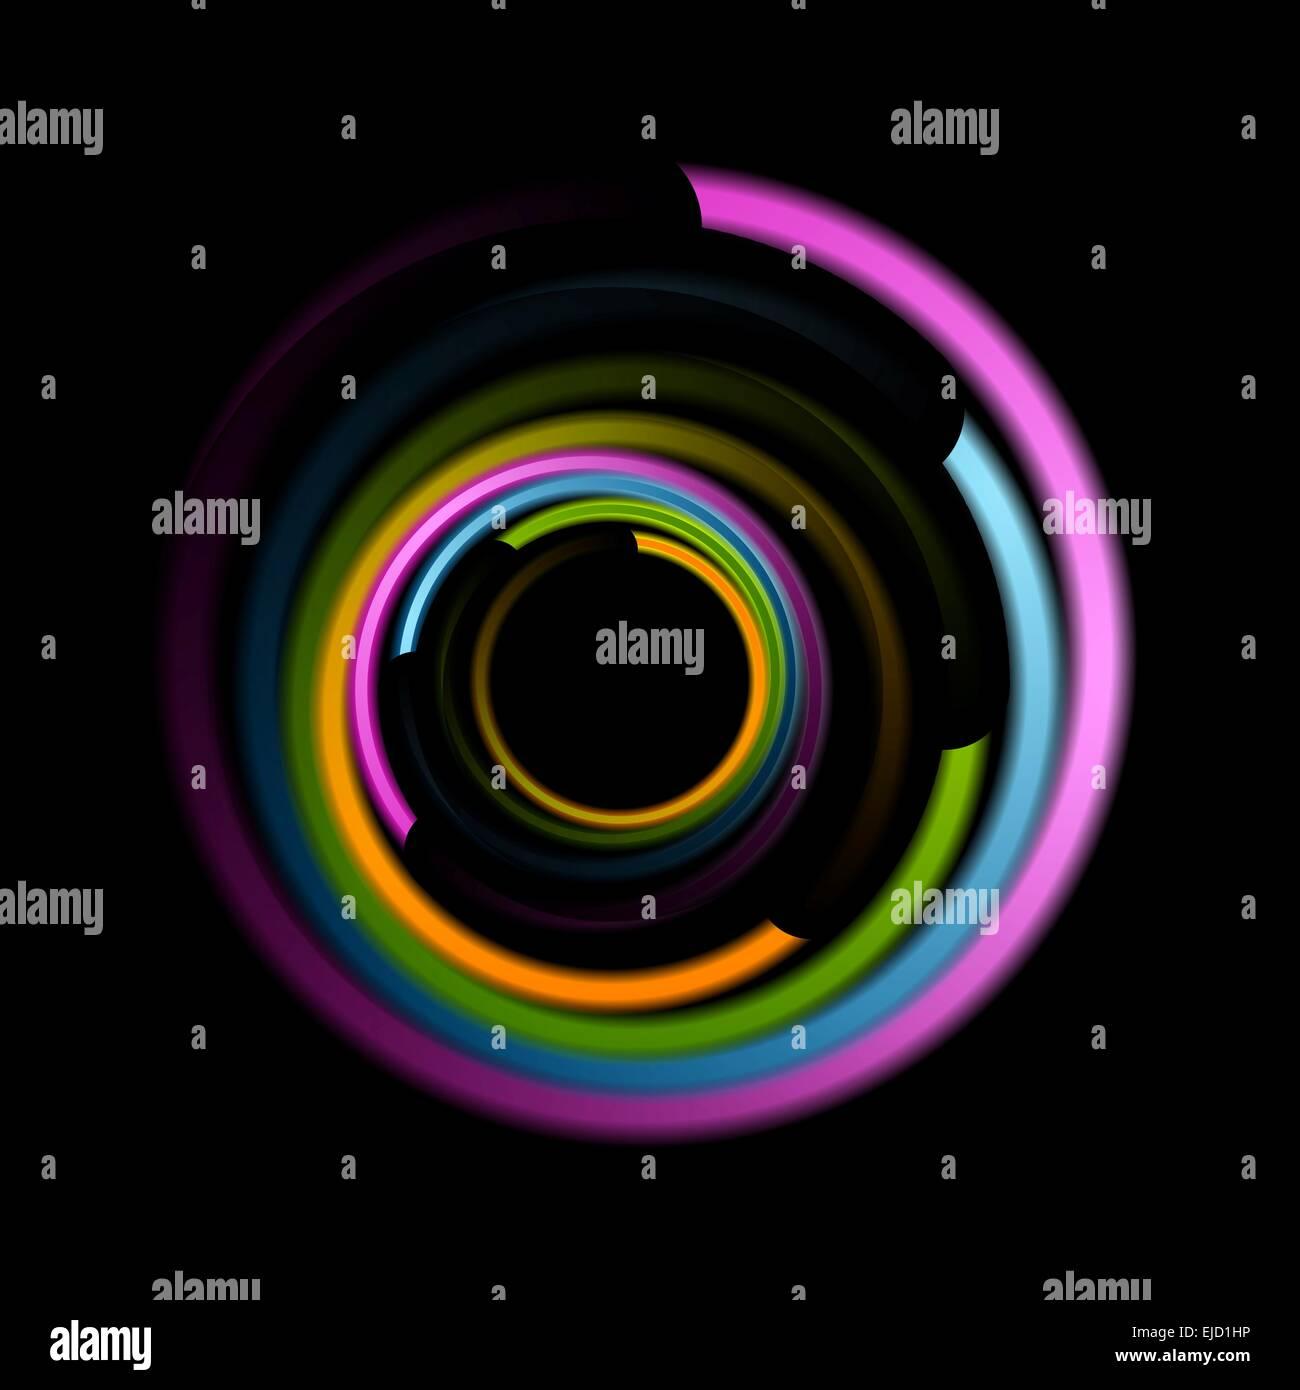 Abstract colorful swirl circle logo - Stock Image